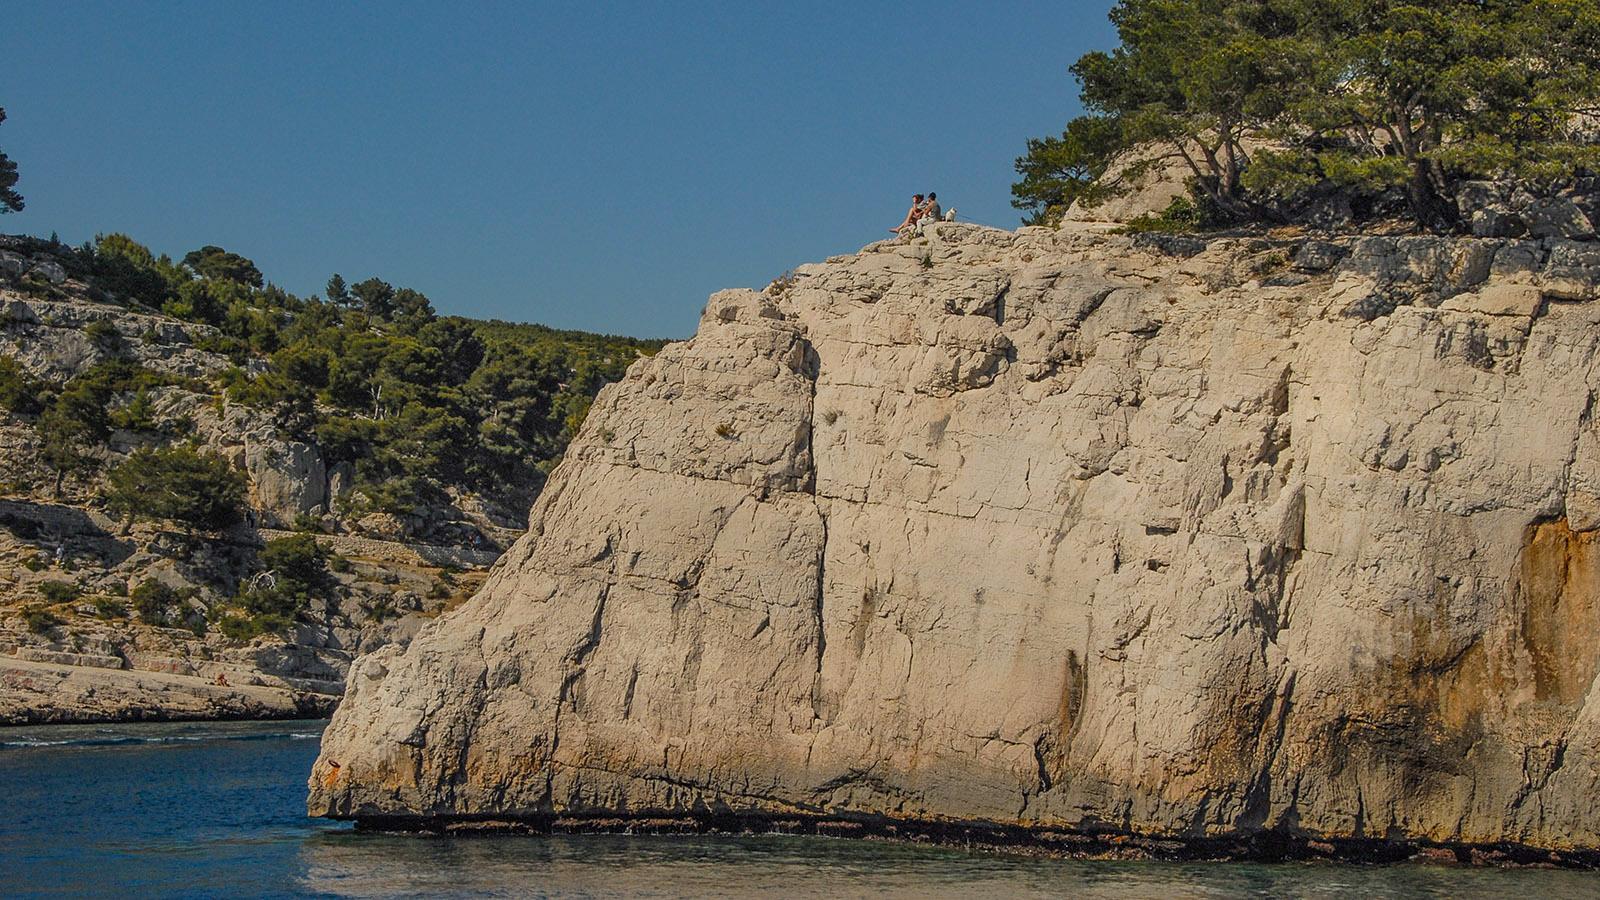 Calanques de Cassis: Ist es nicht wunderschön, das Sonnenplätzchen in der Calanque de Port-Pin. Foto: Hilke Maunder